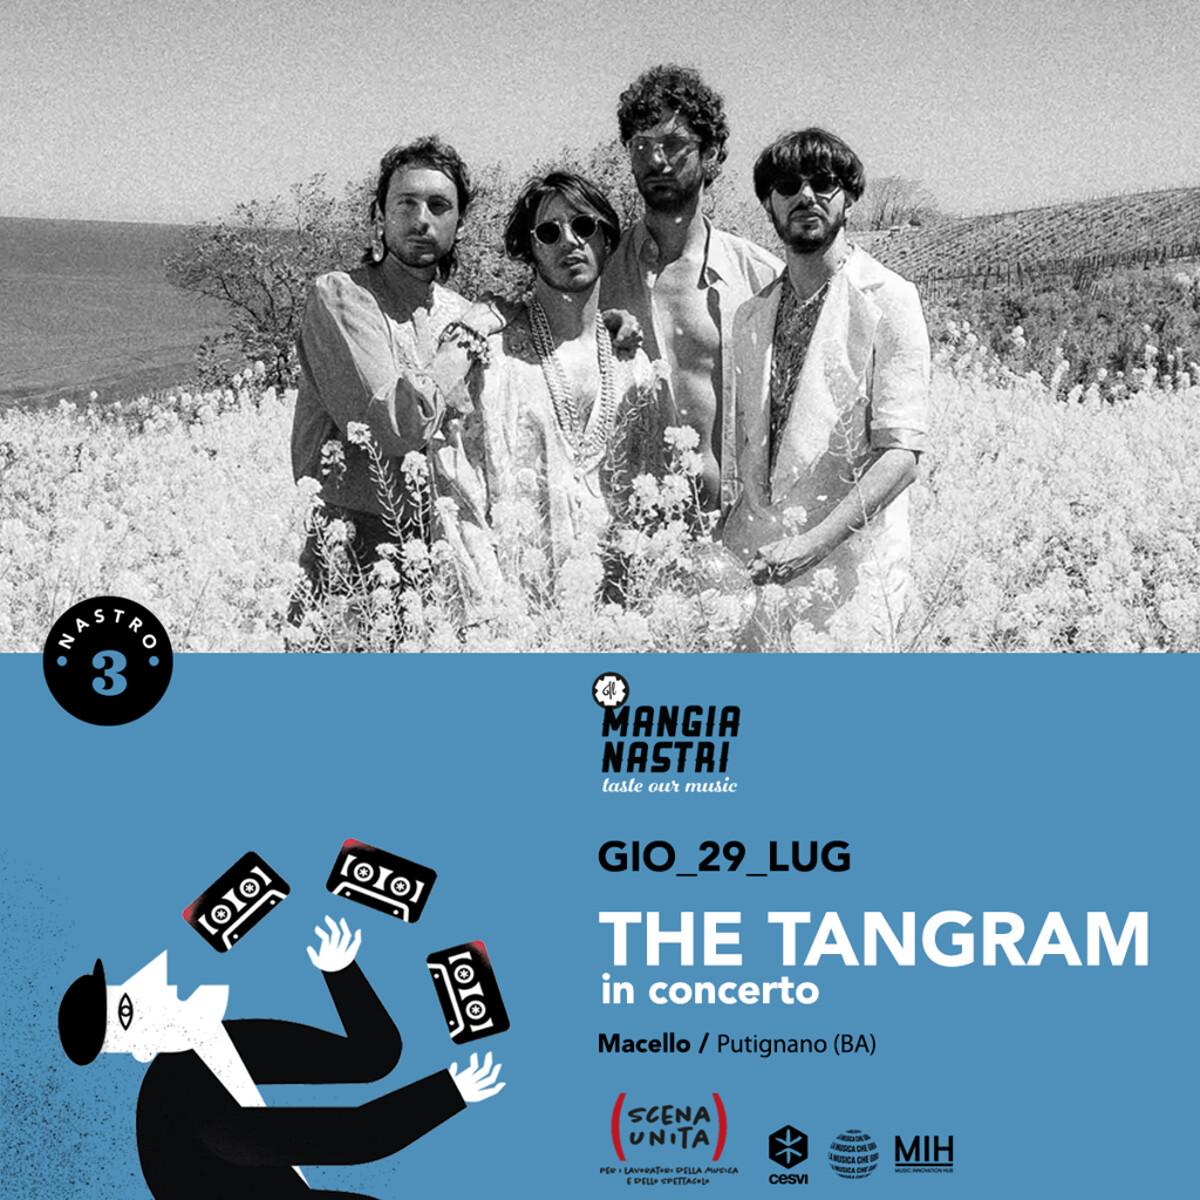 Il mangianastri: The Tangram in concerto